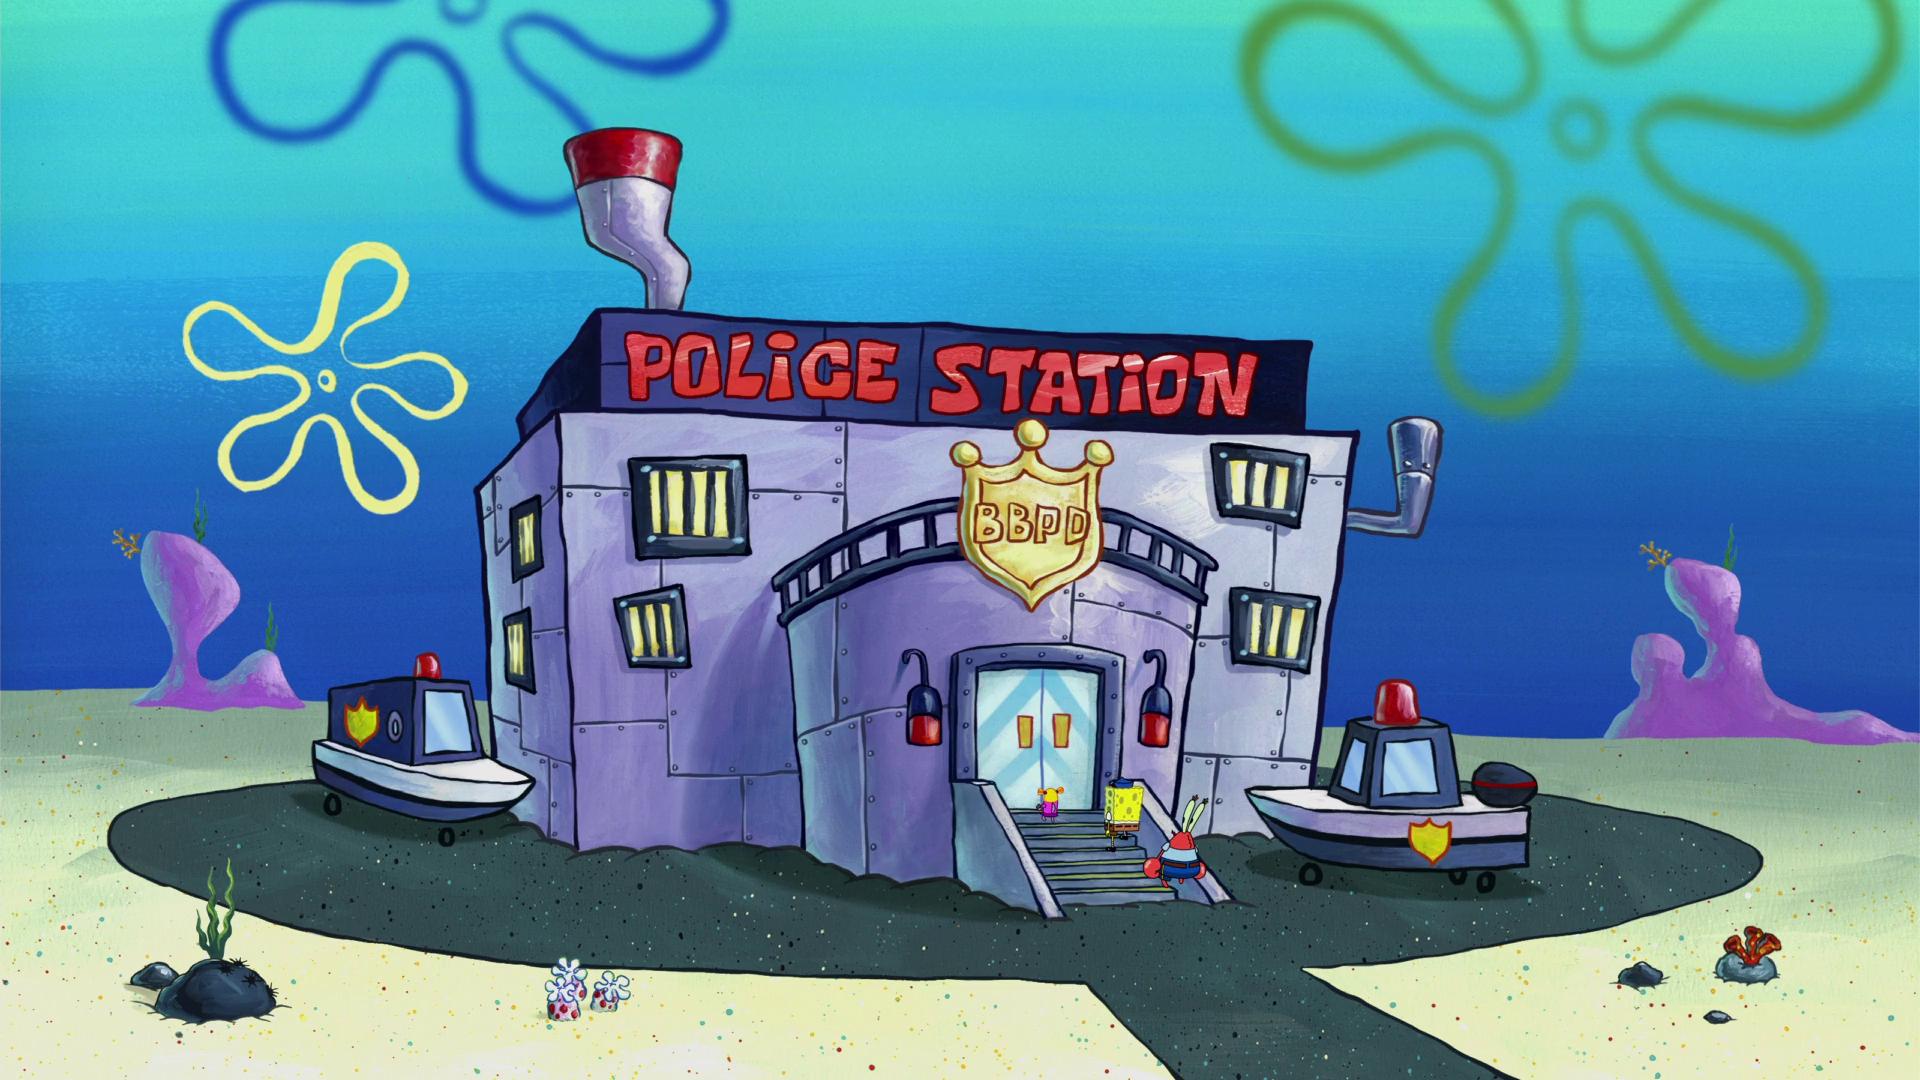 Bottom police